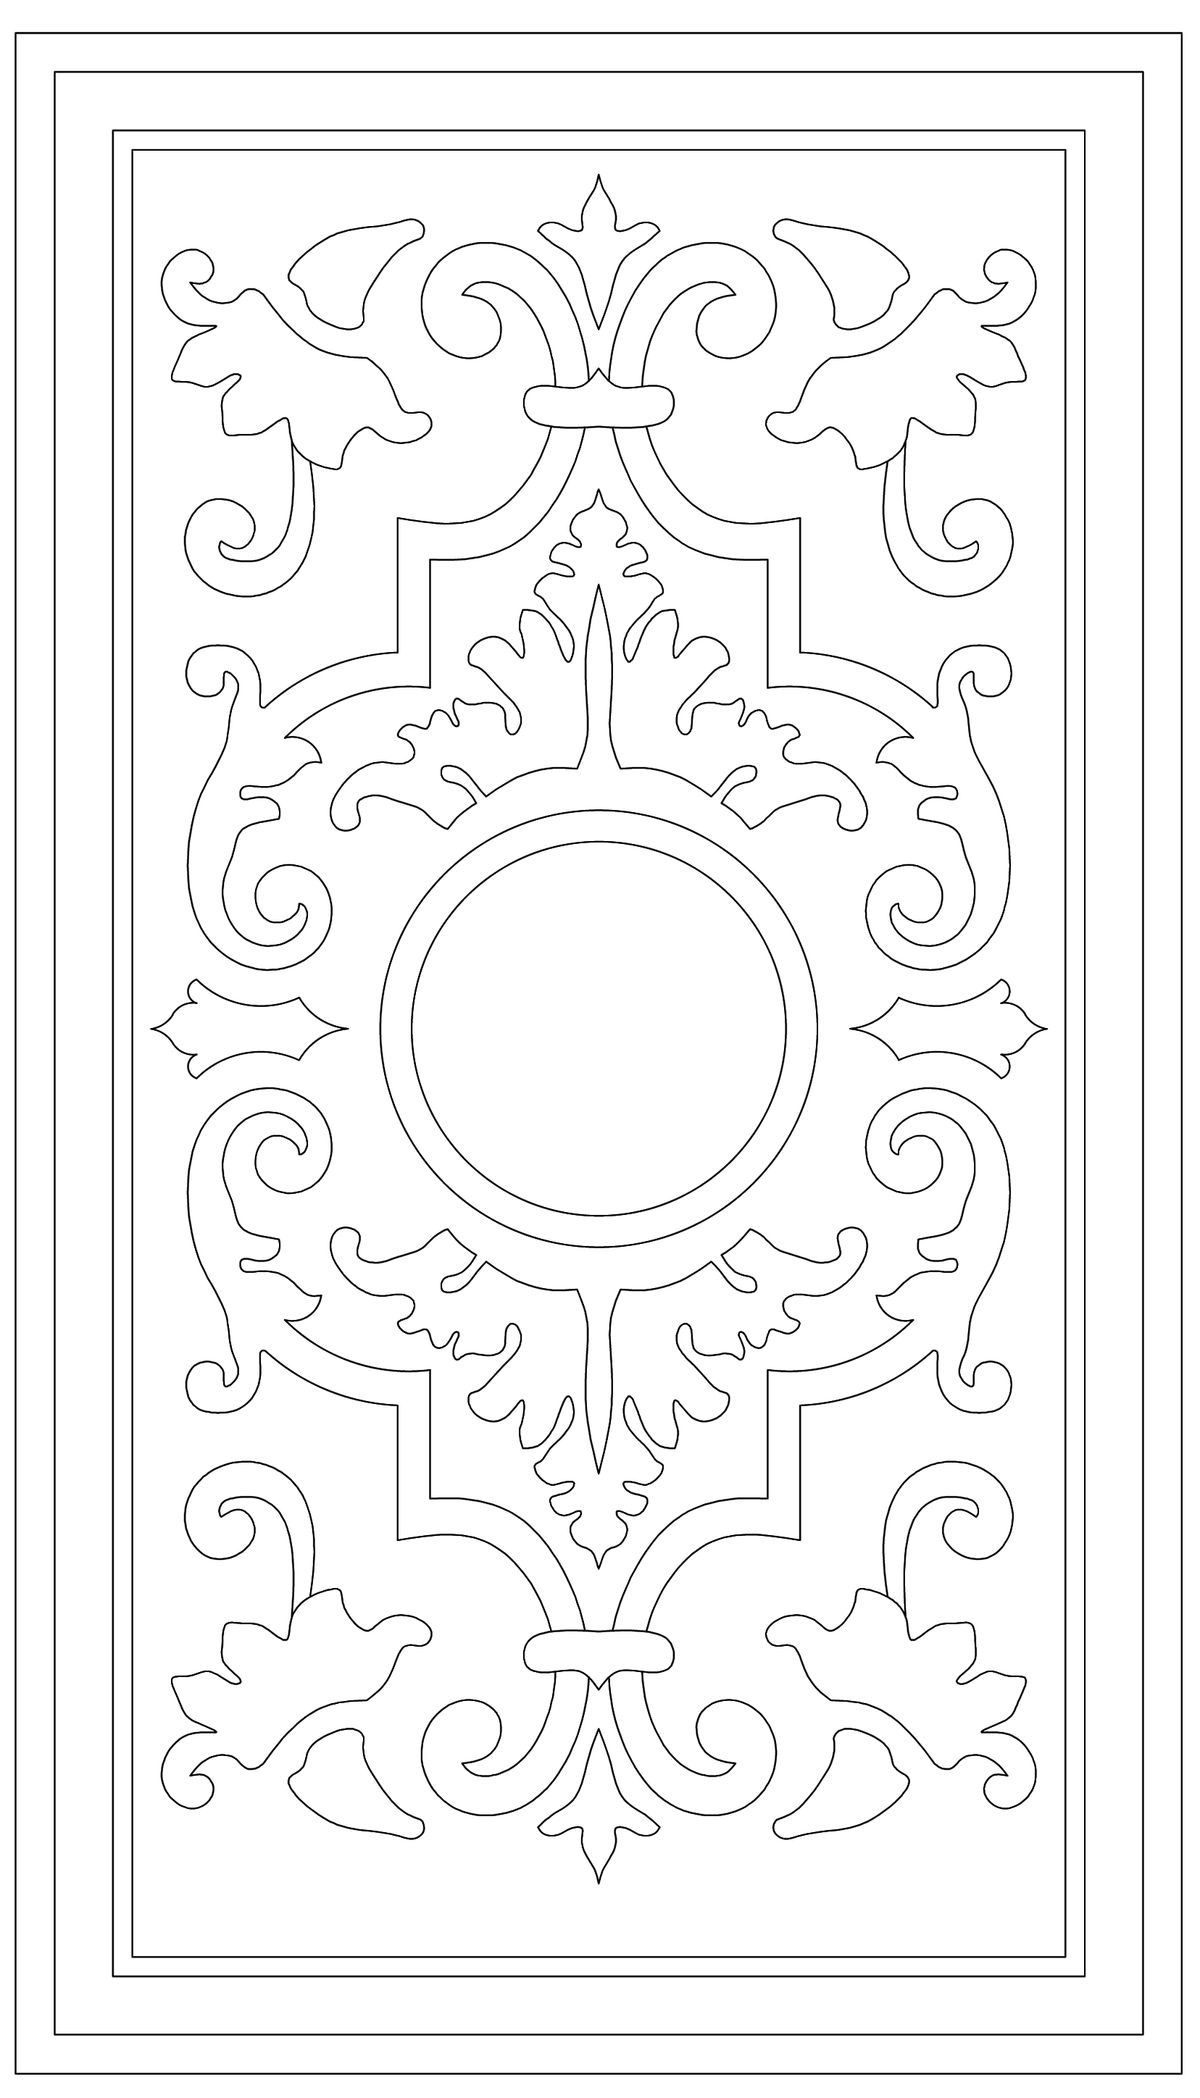 Pin By Andrzej Matuszak On Drawings Stencil Patterns Stencil Designs Stencil Pattern